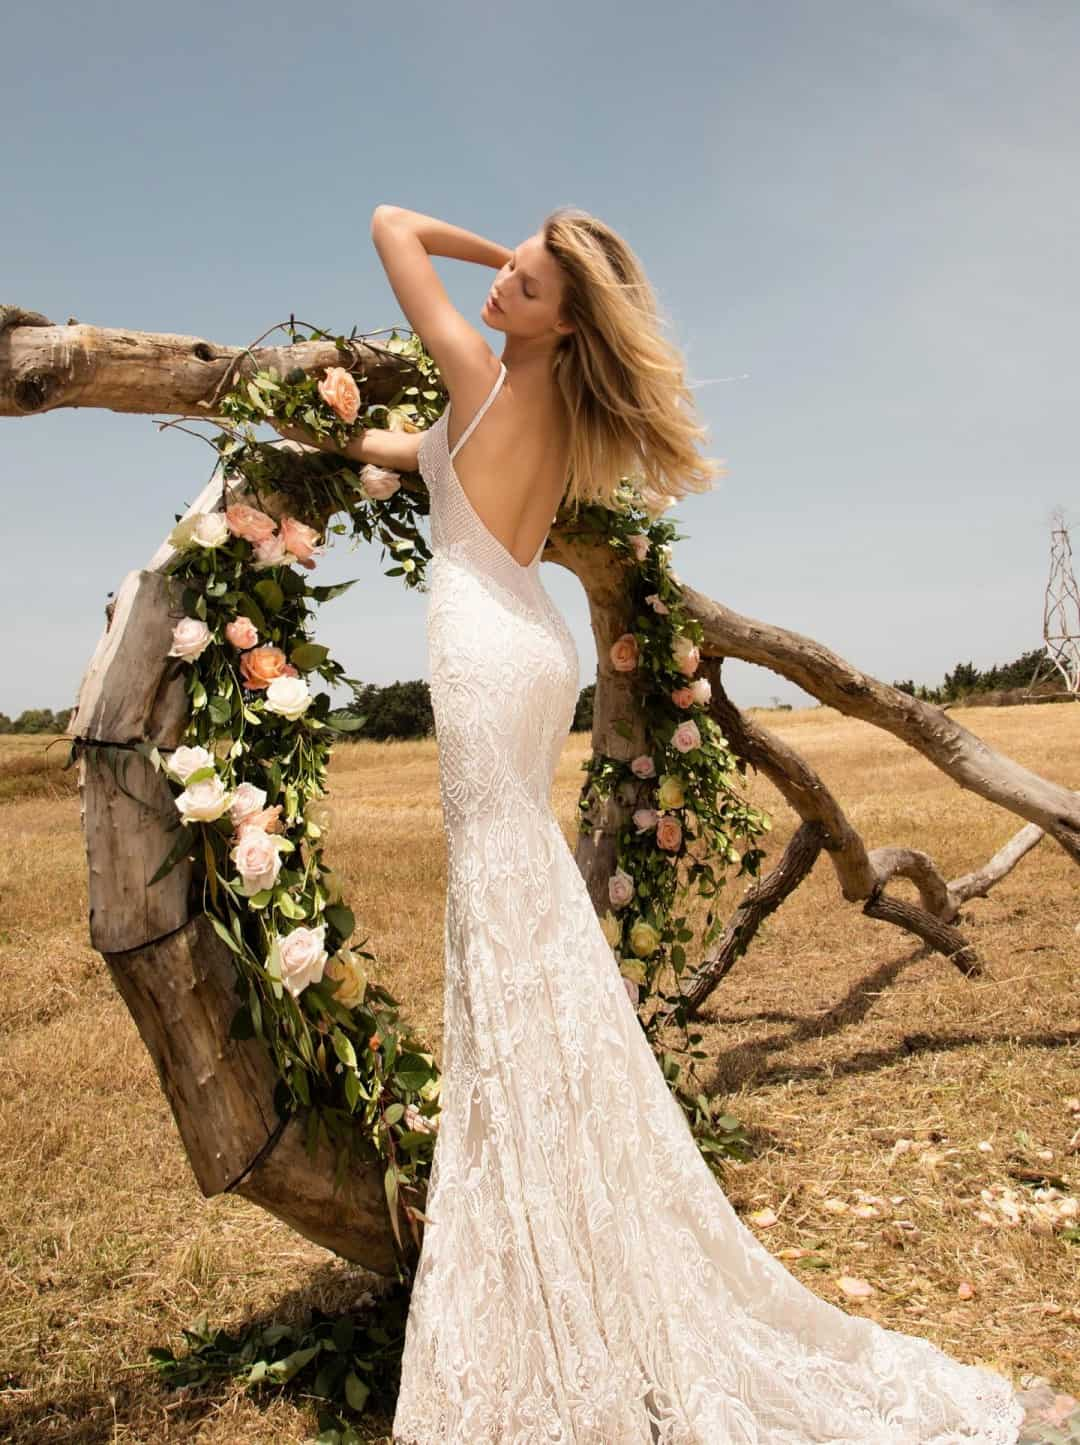 Haute Couture Wedding Dresses - Gala-708-back-1-1440x1926